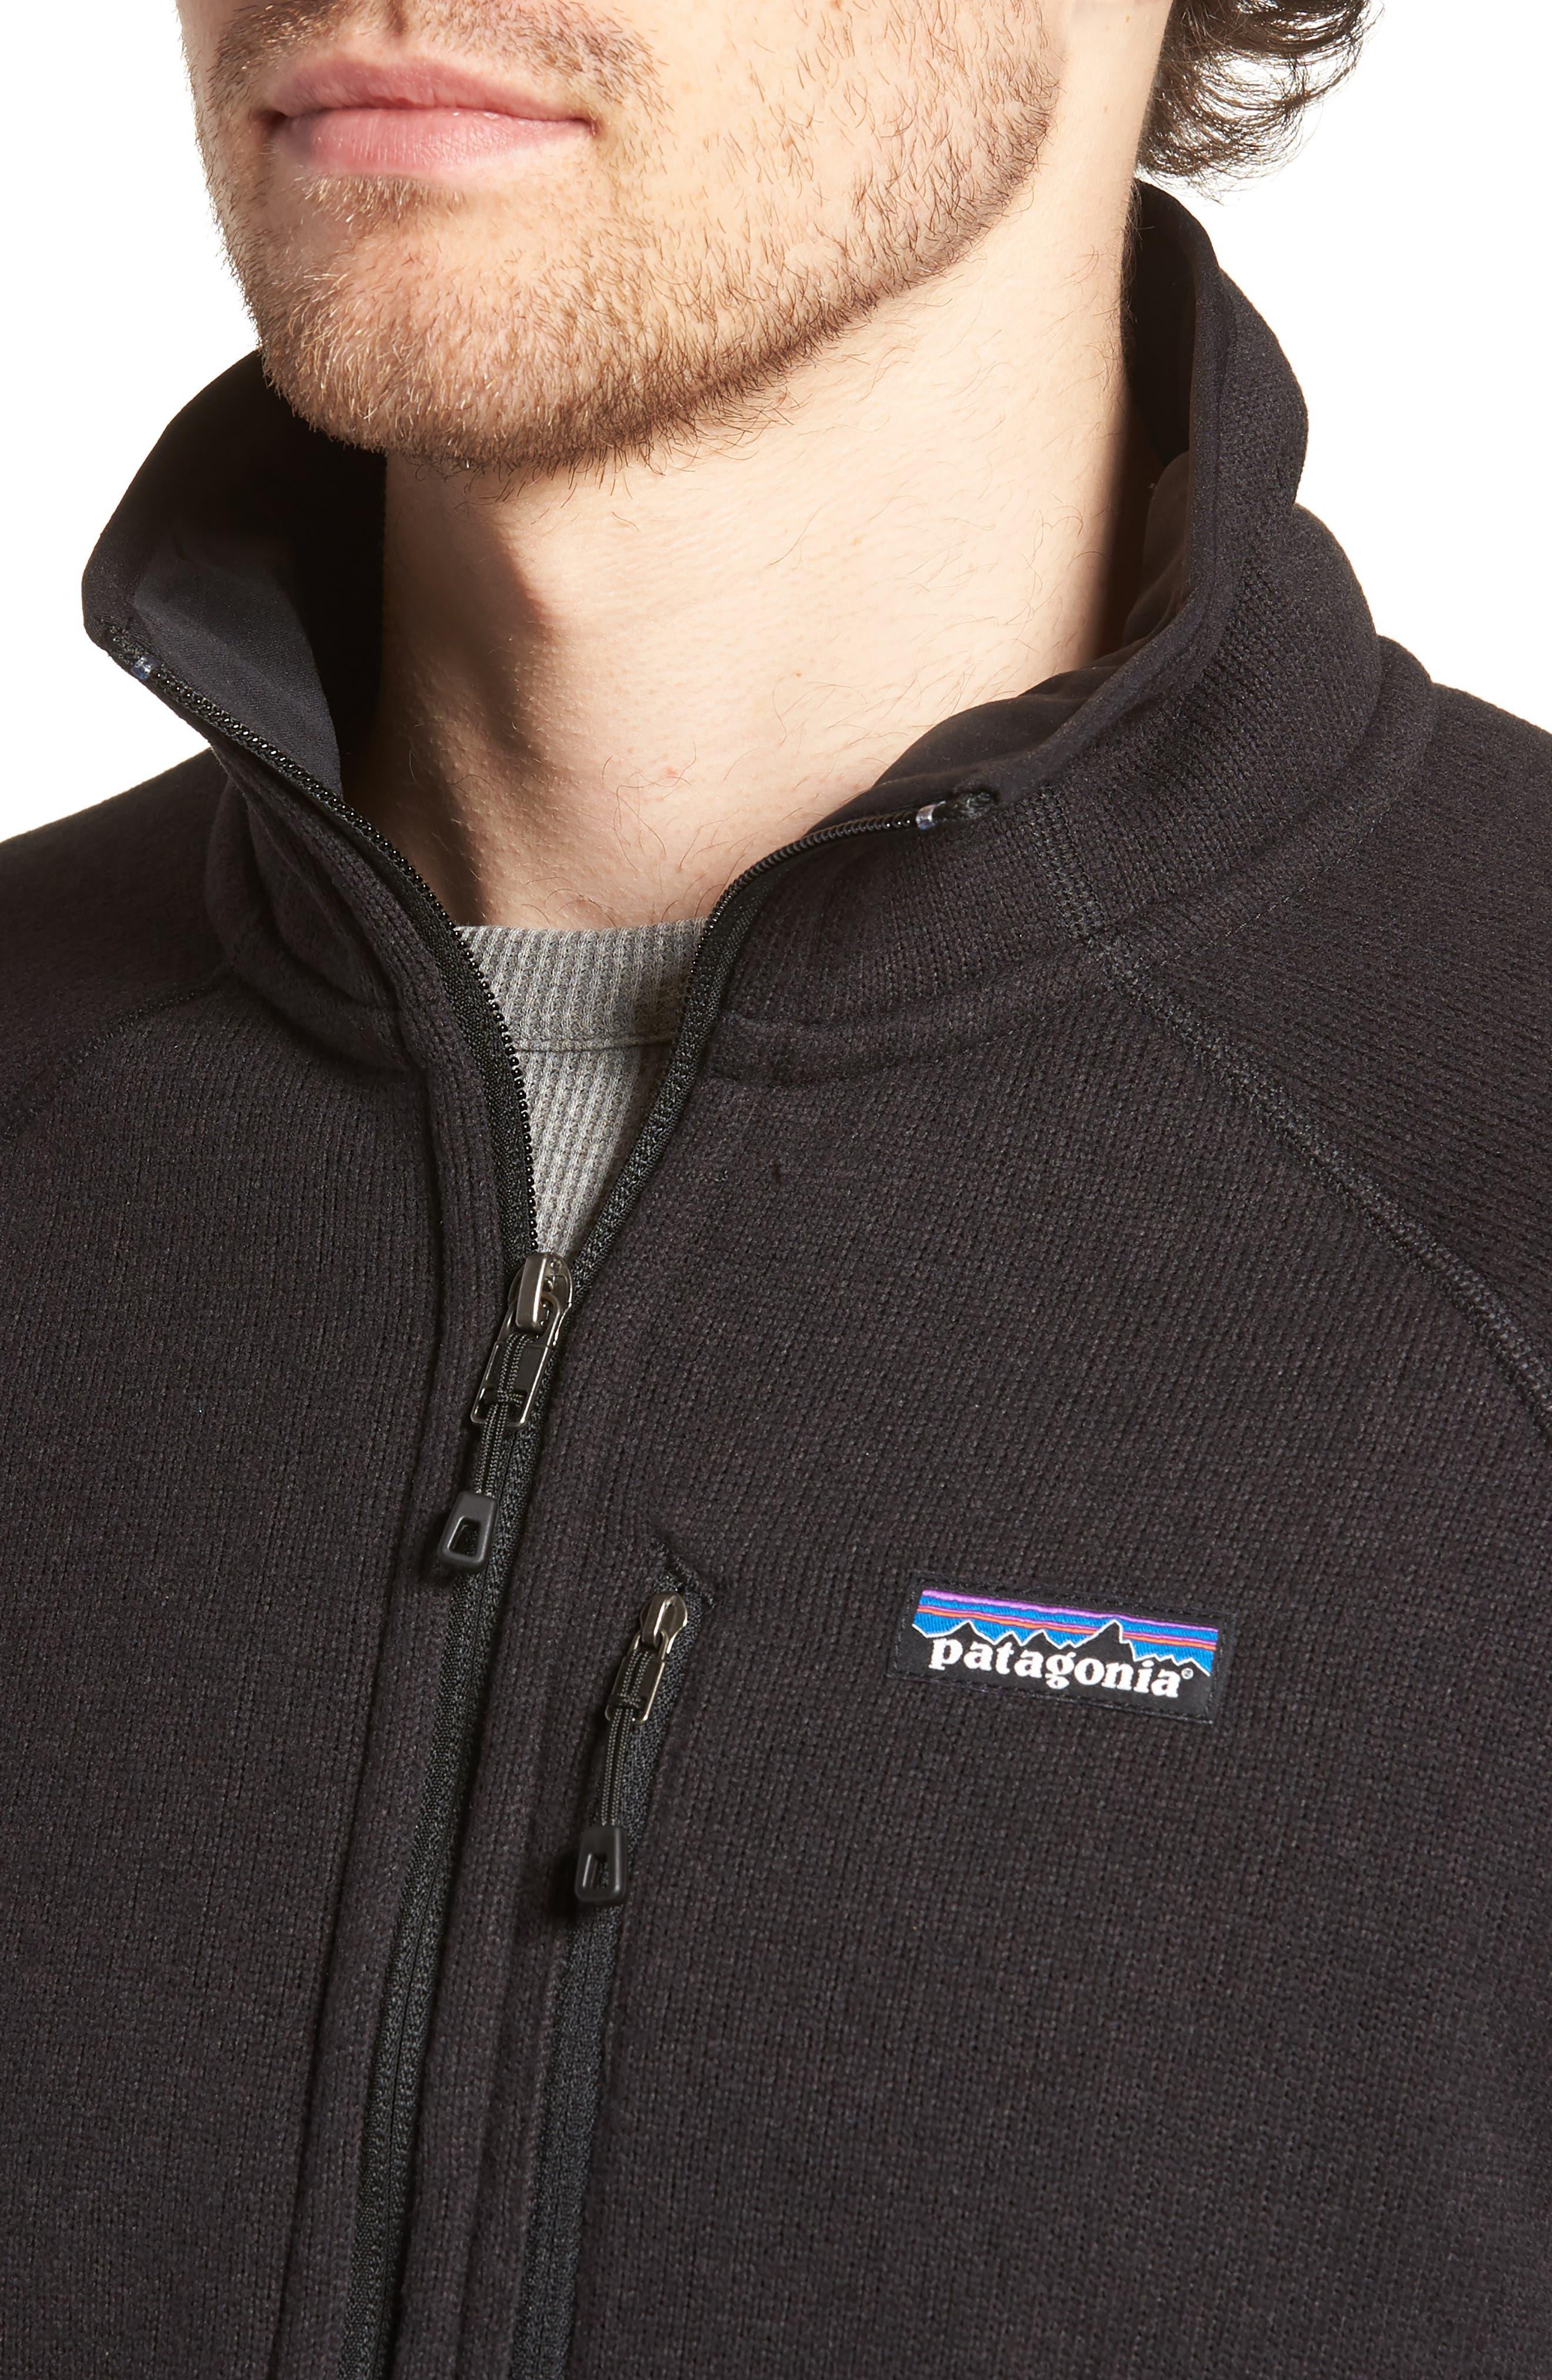 Better Sweater Zip Front Jacket,                             Alternate thumbnail 4, color,                             Blk